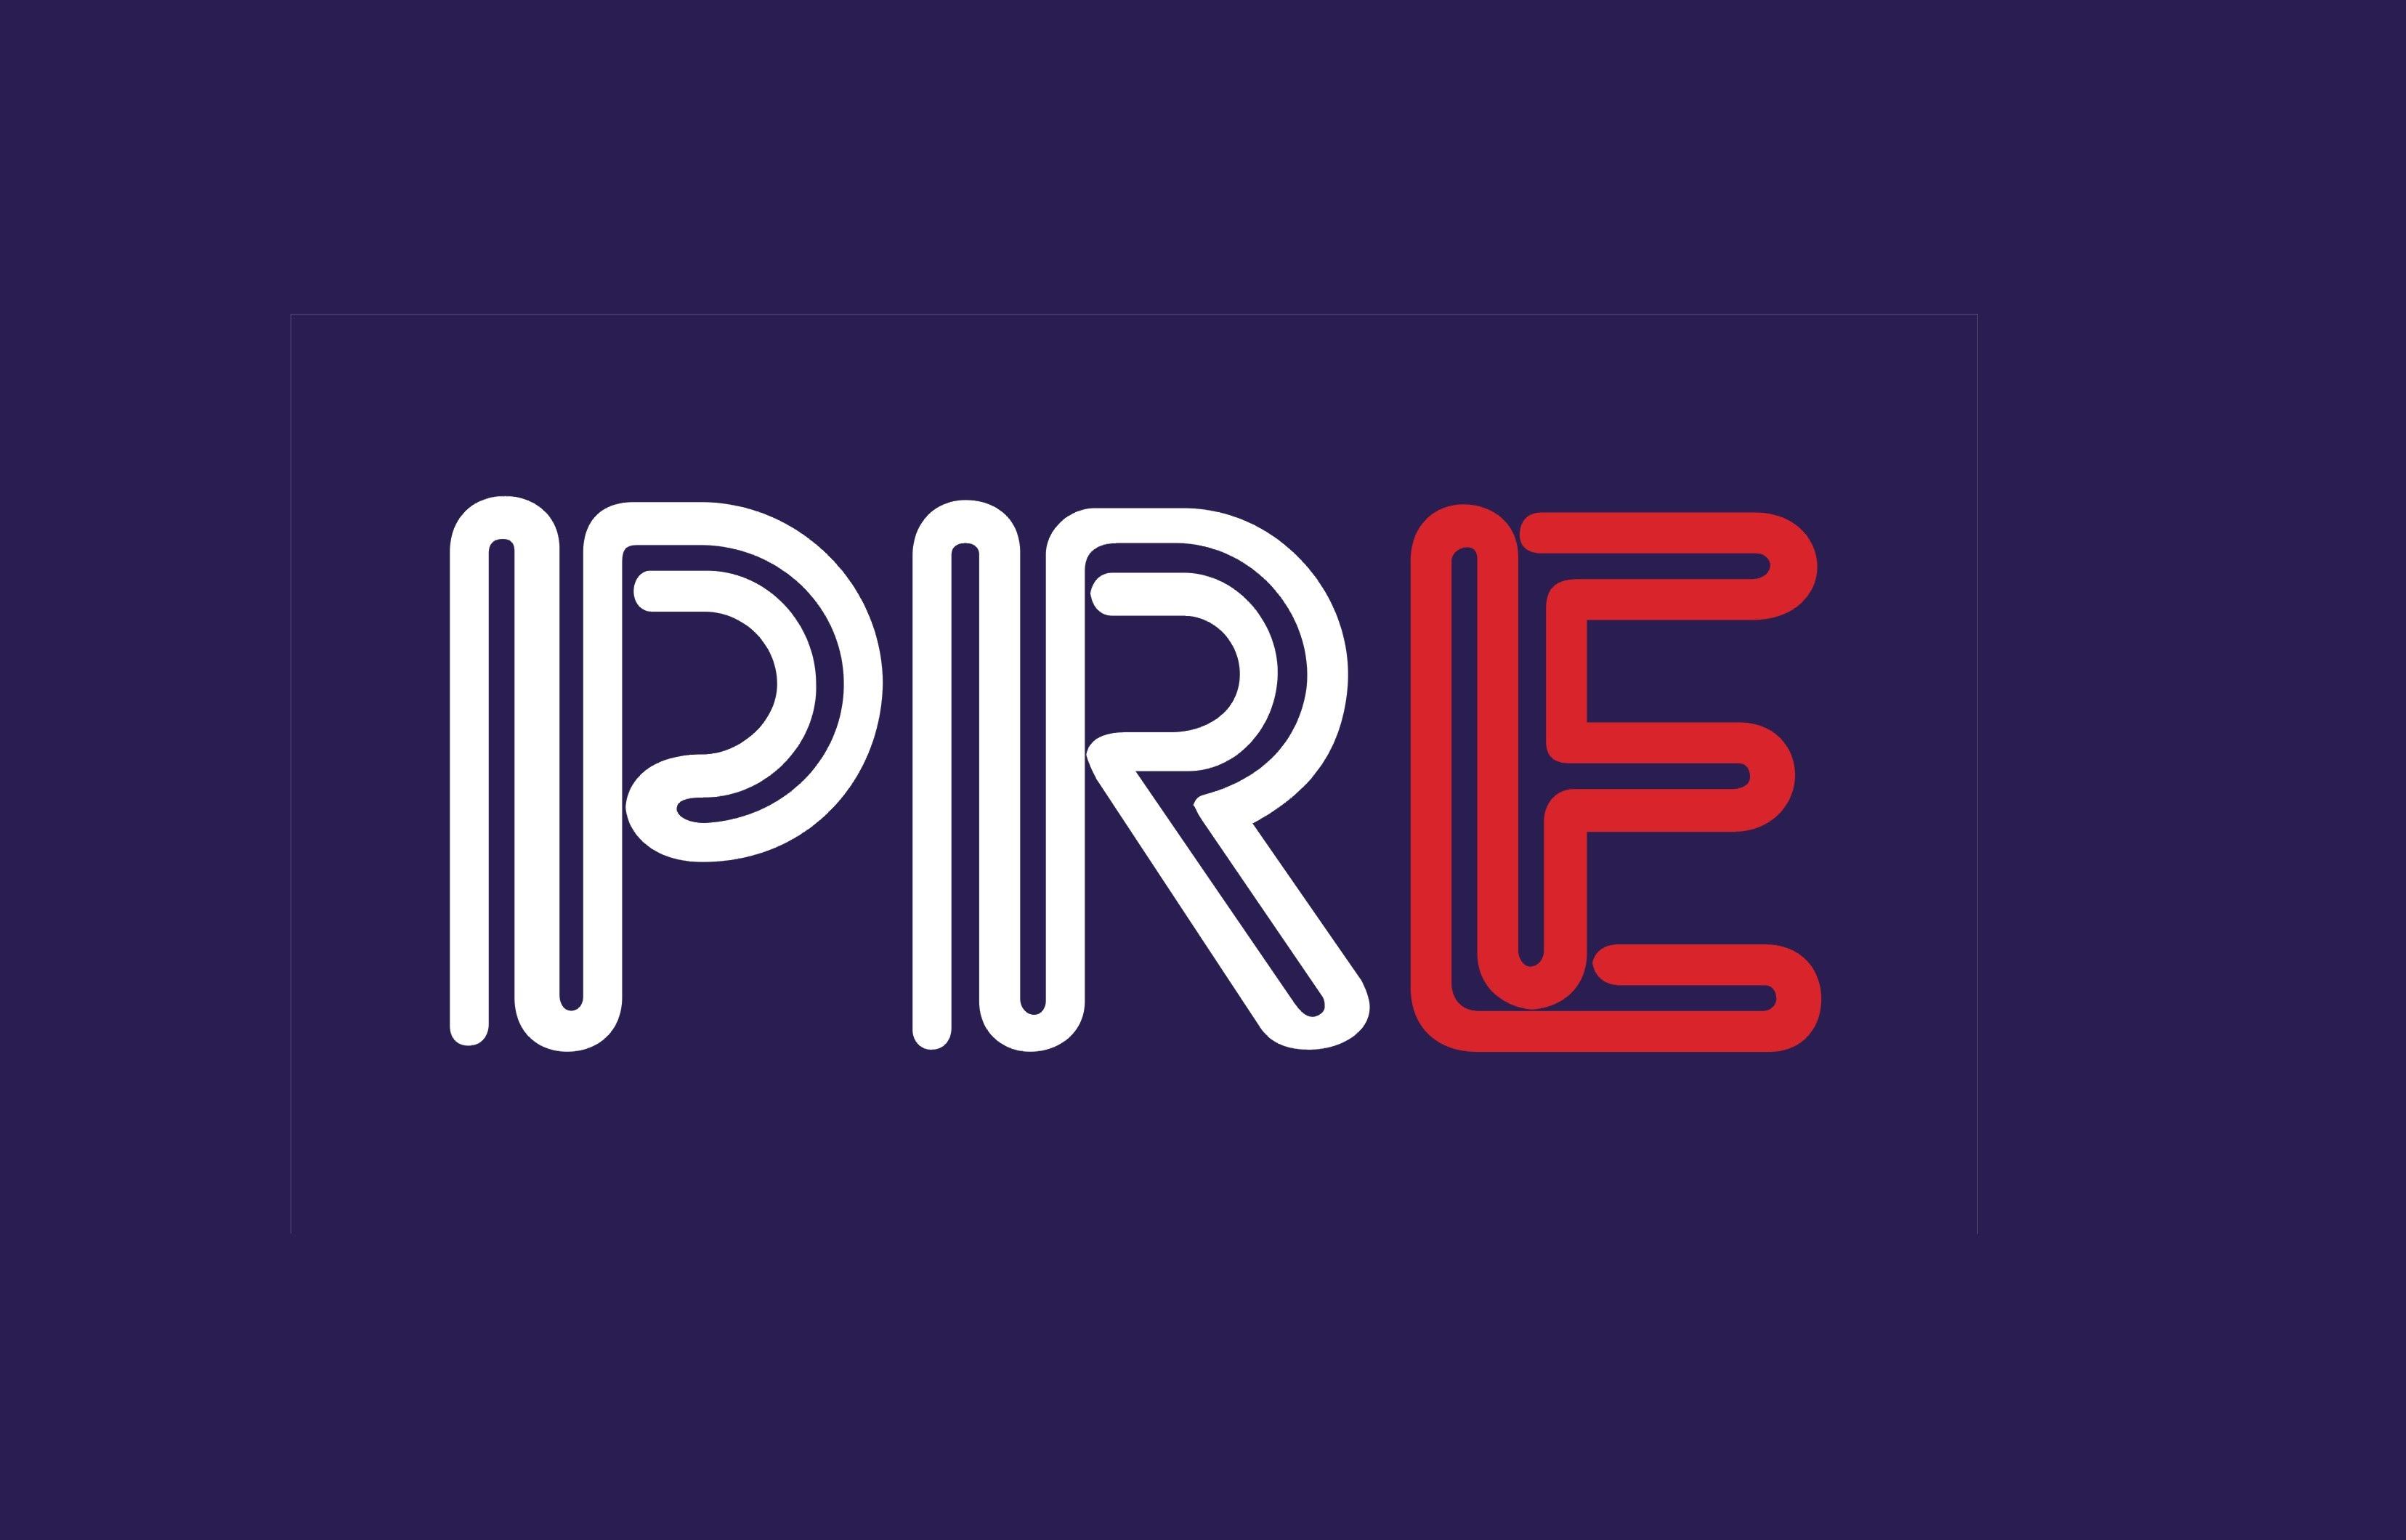 PRE (logo)